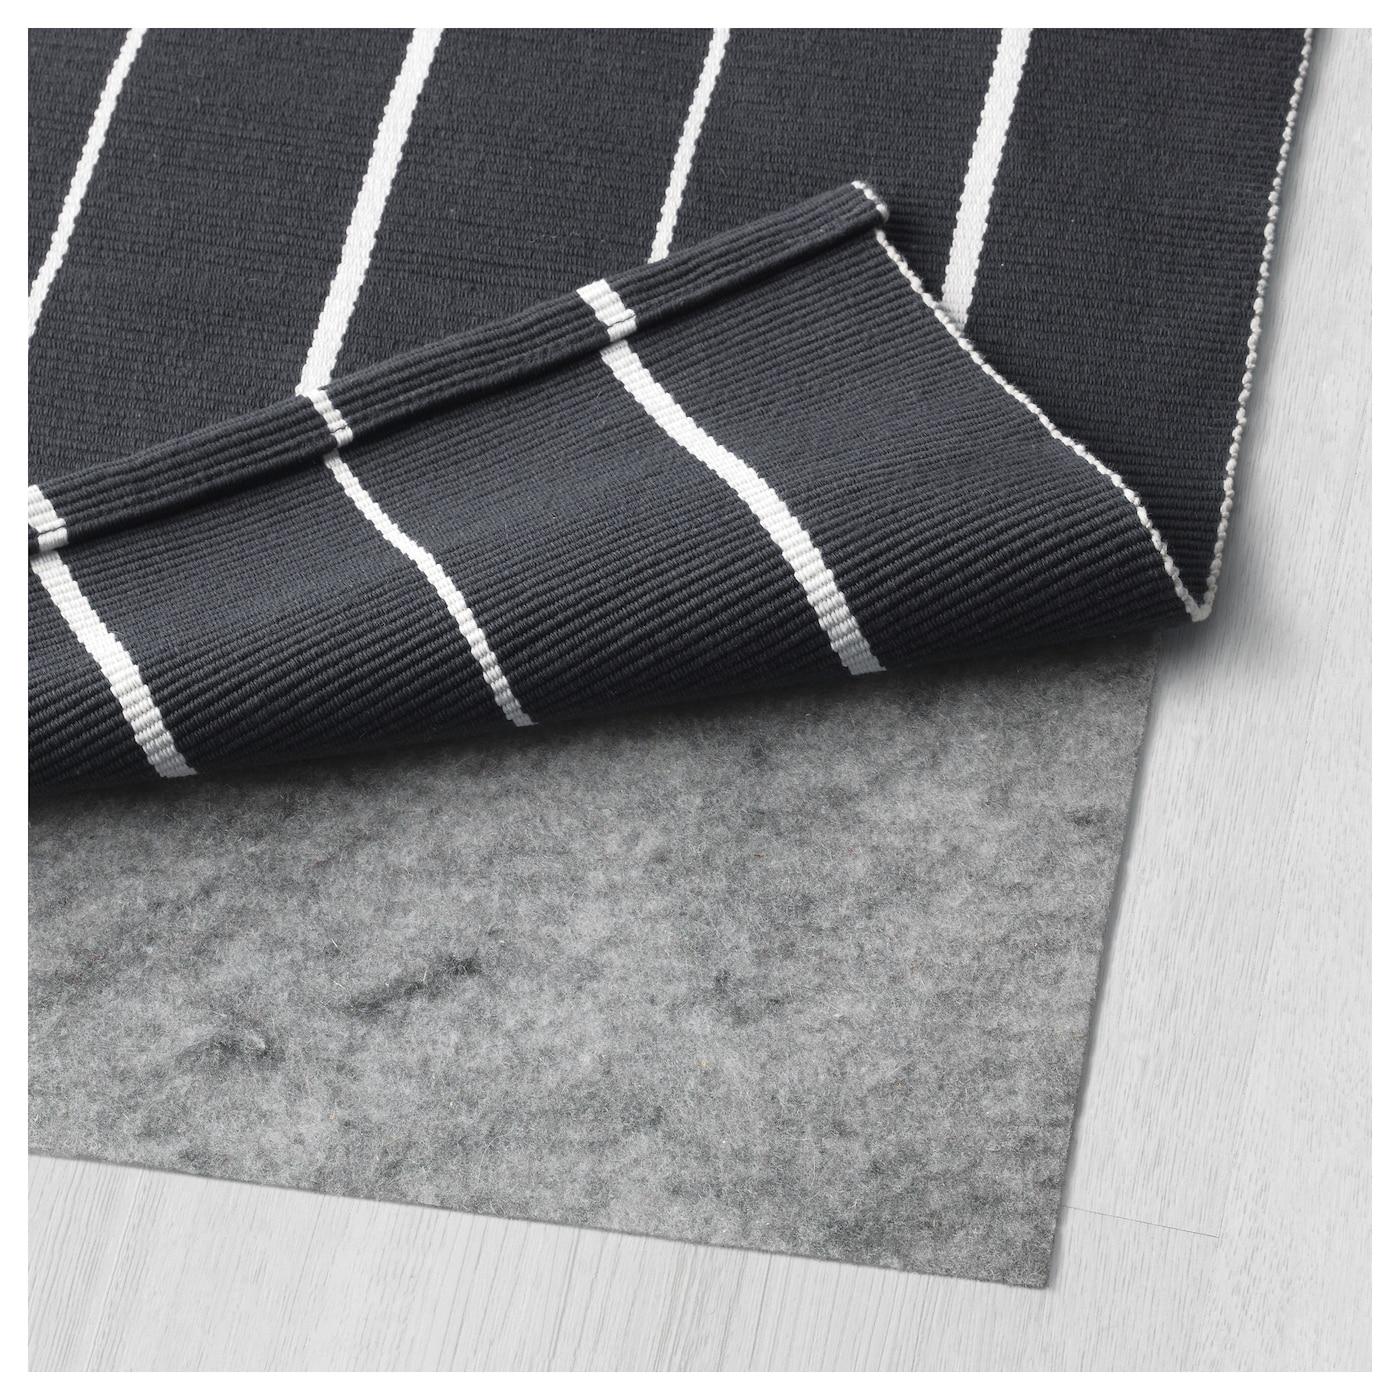 S ften tapis tiss plat noir blanc 80x150 cm ikea - Tapis tisse a plat ...